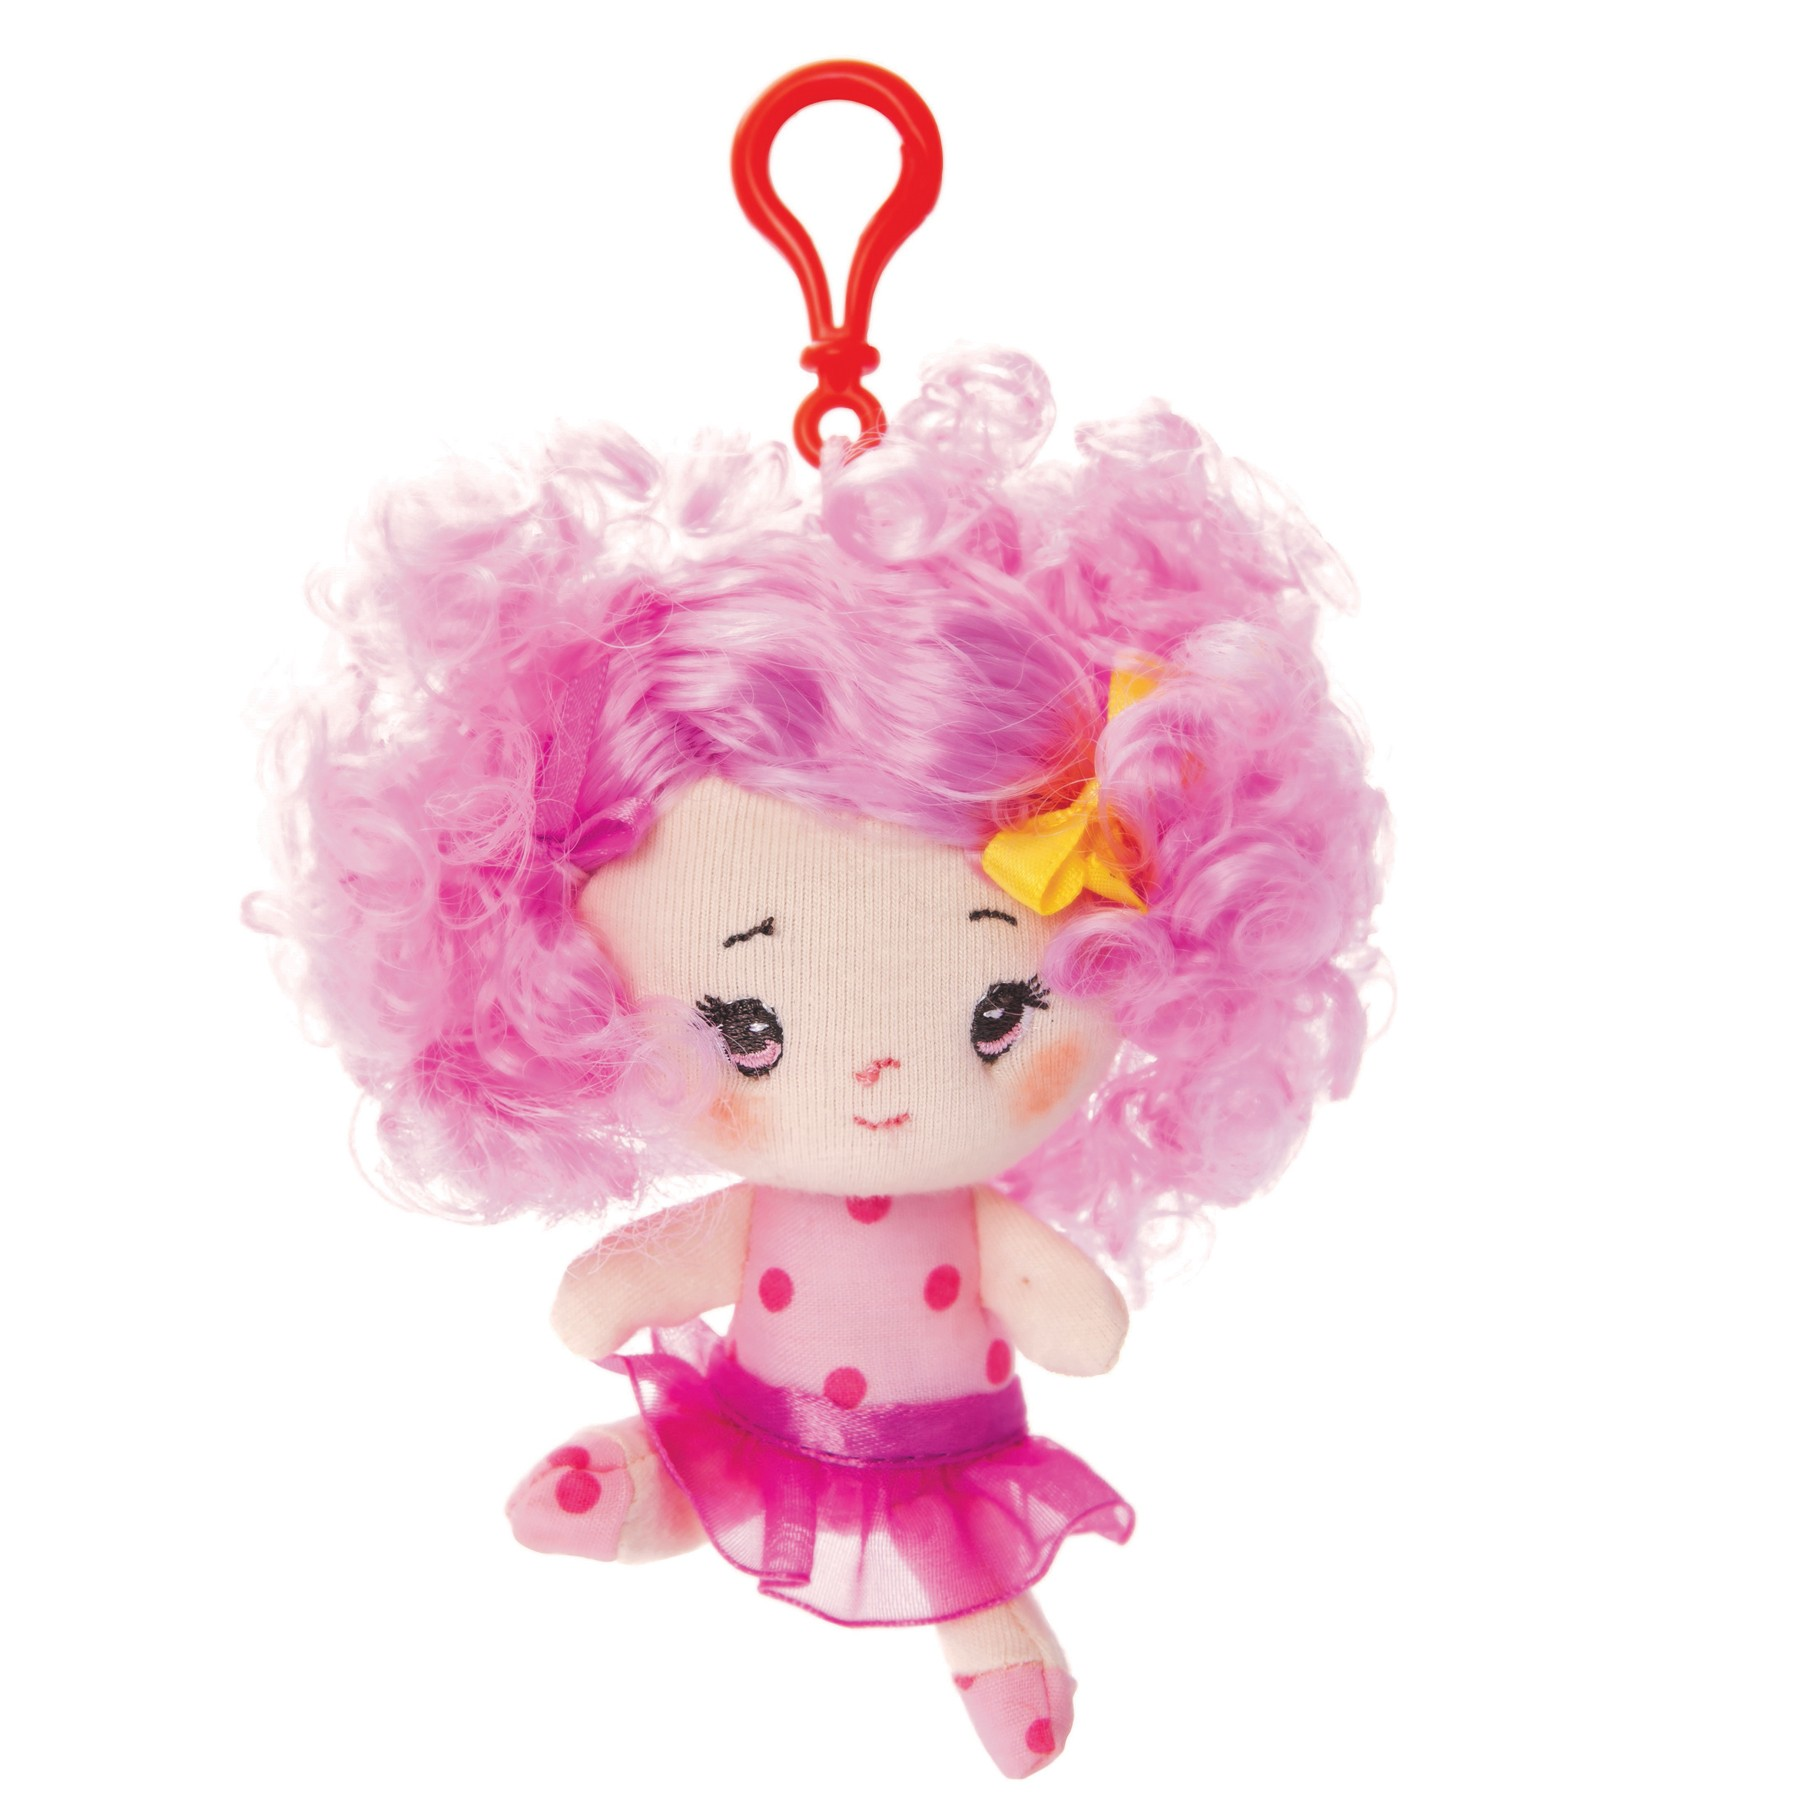 Cutie Curls Emma Backpack Clip